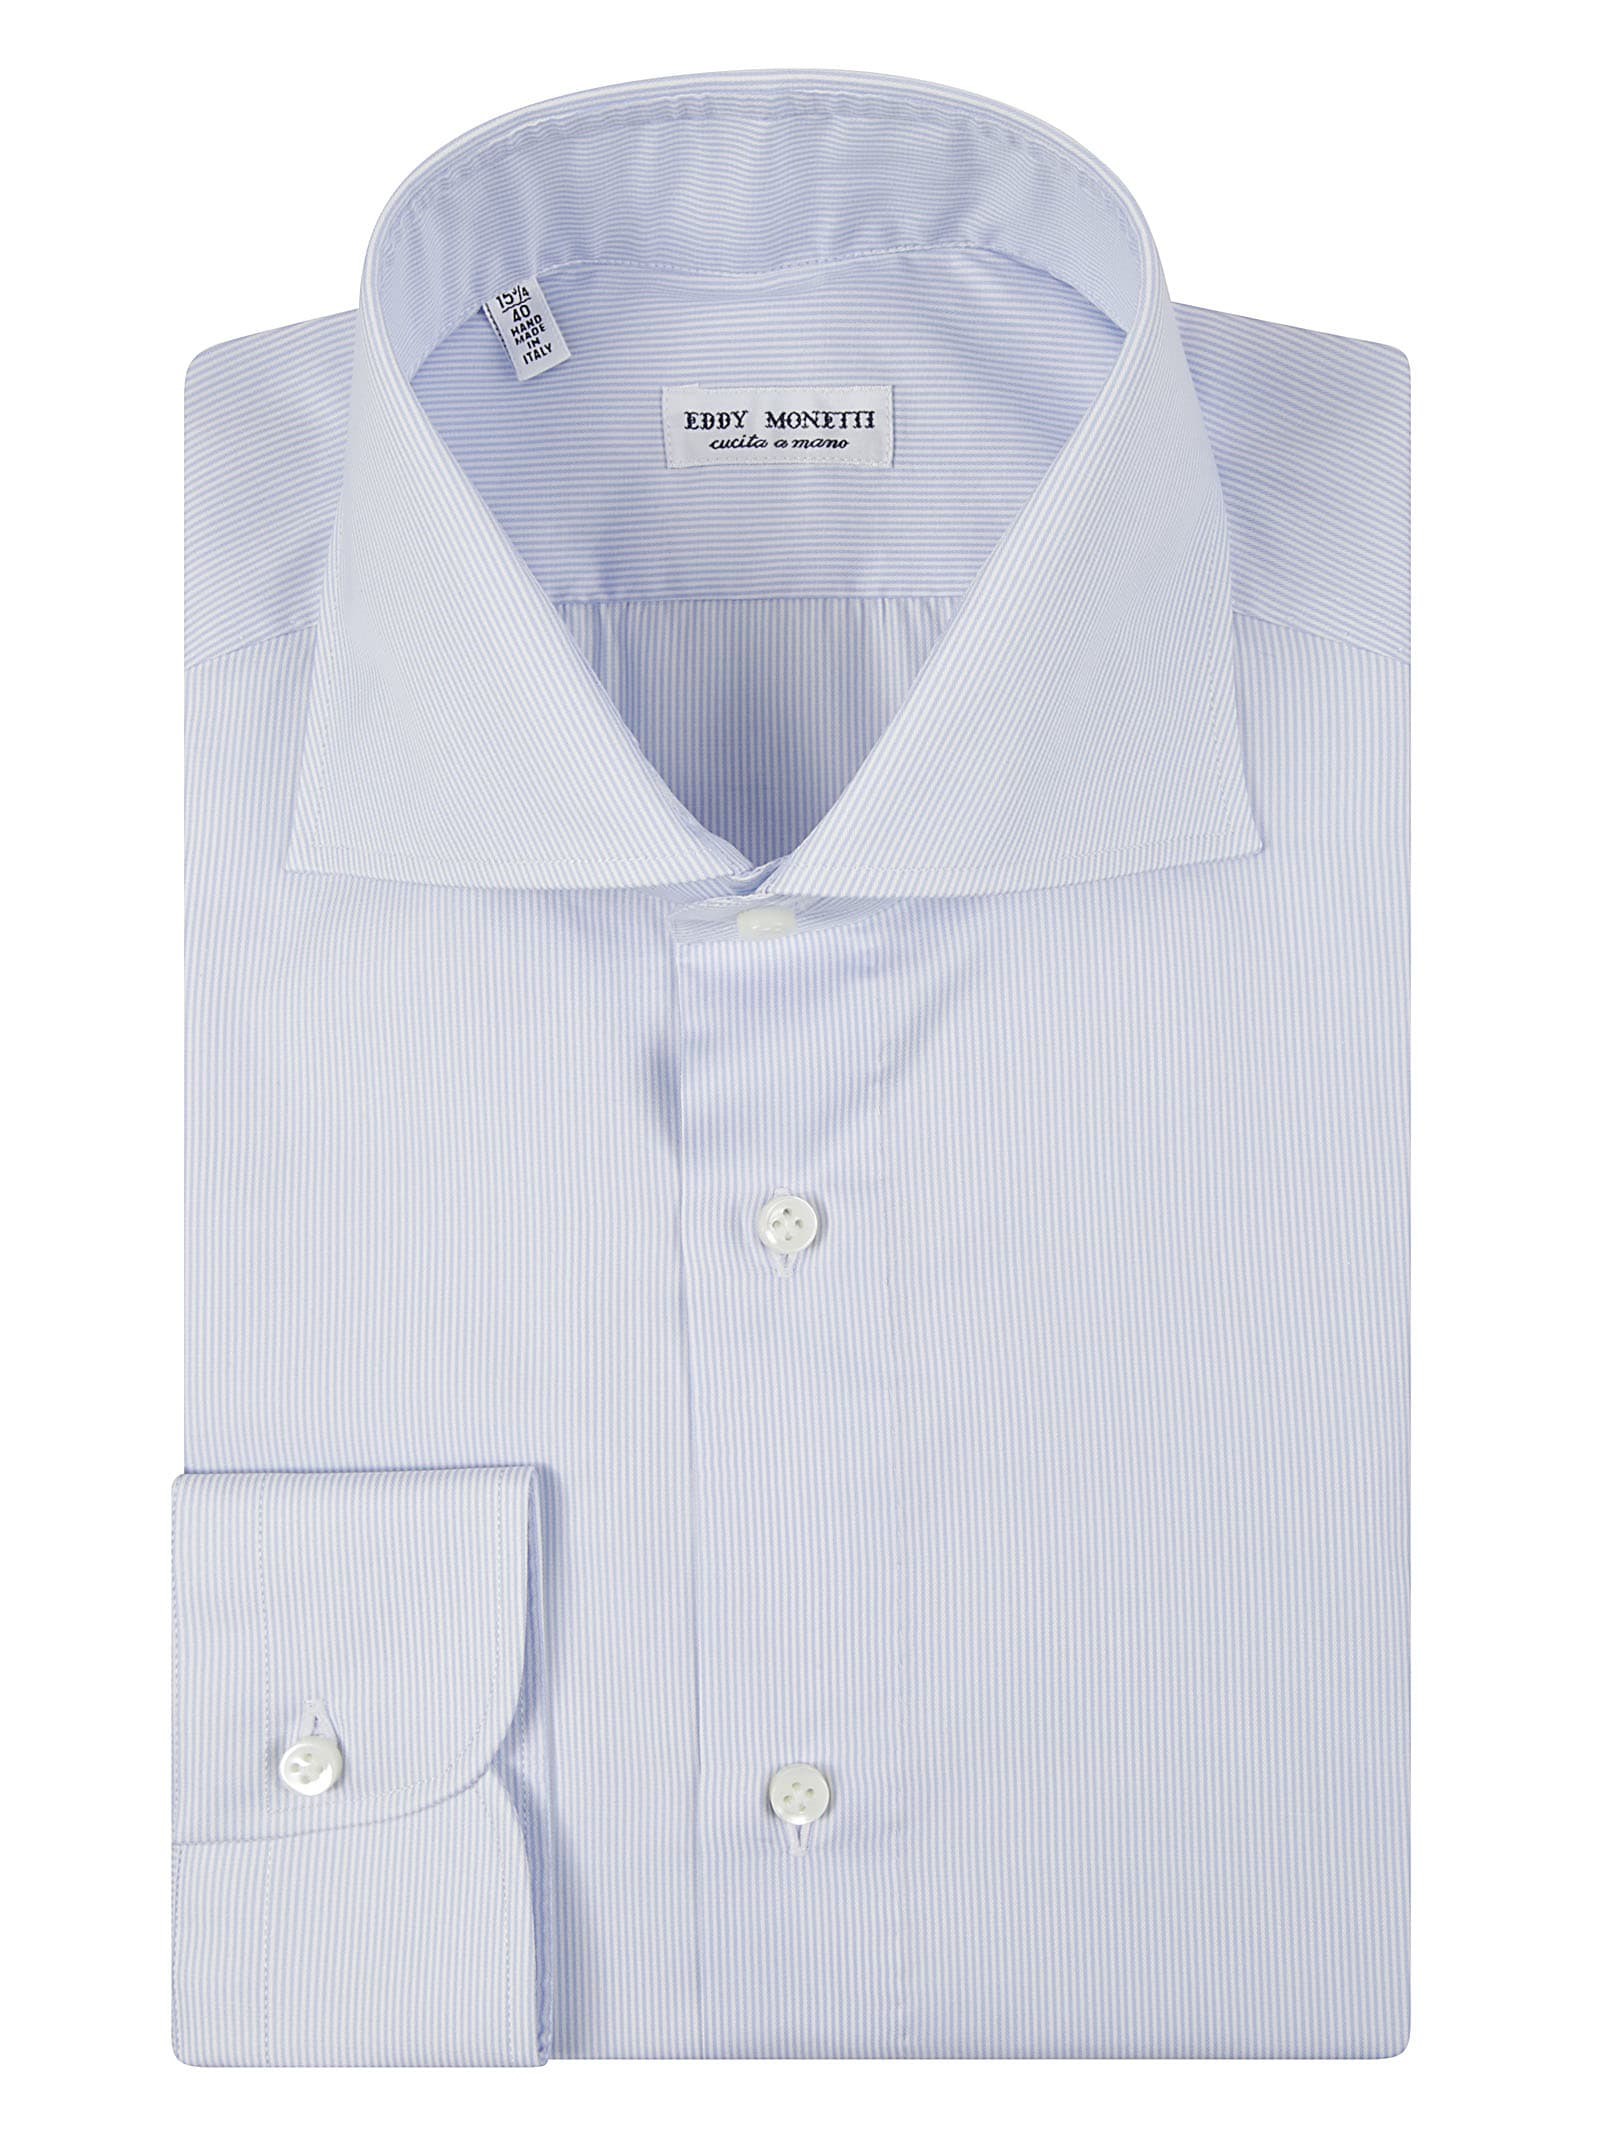 French Collar Striped Shirt